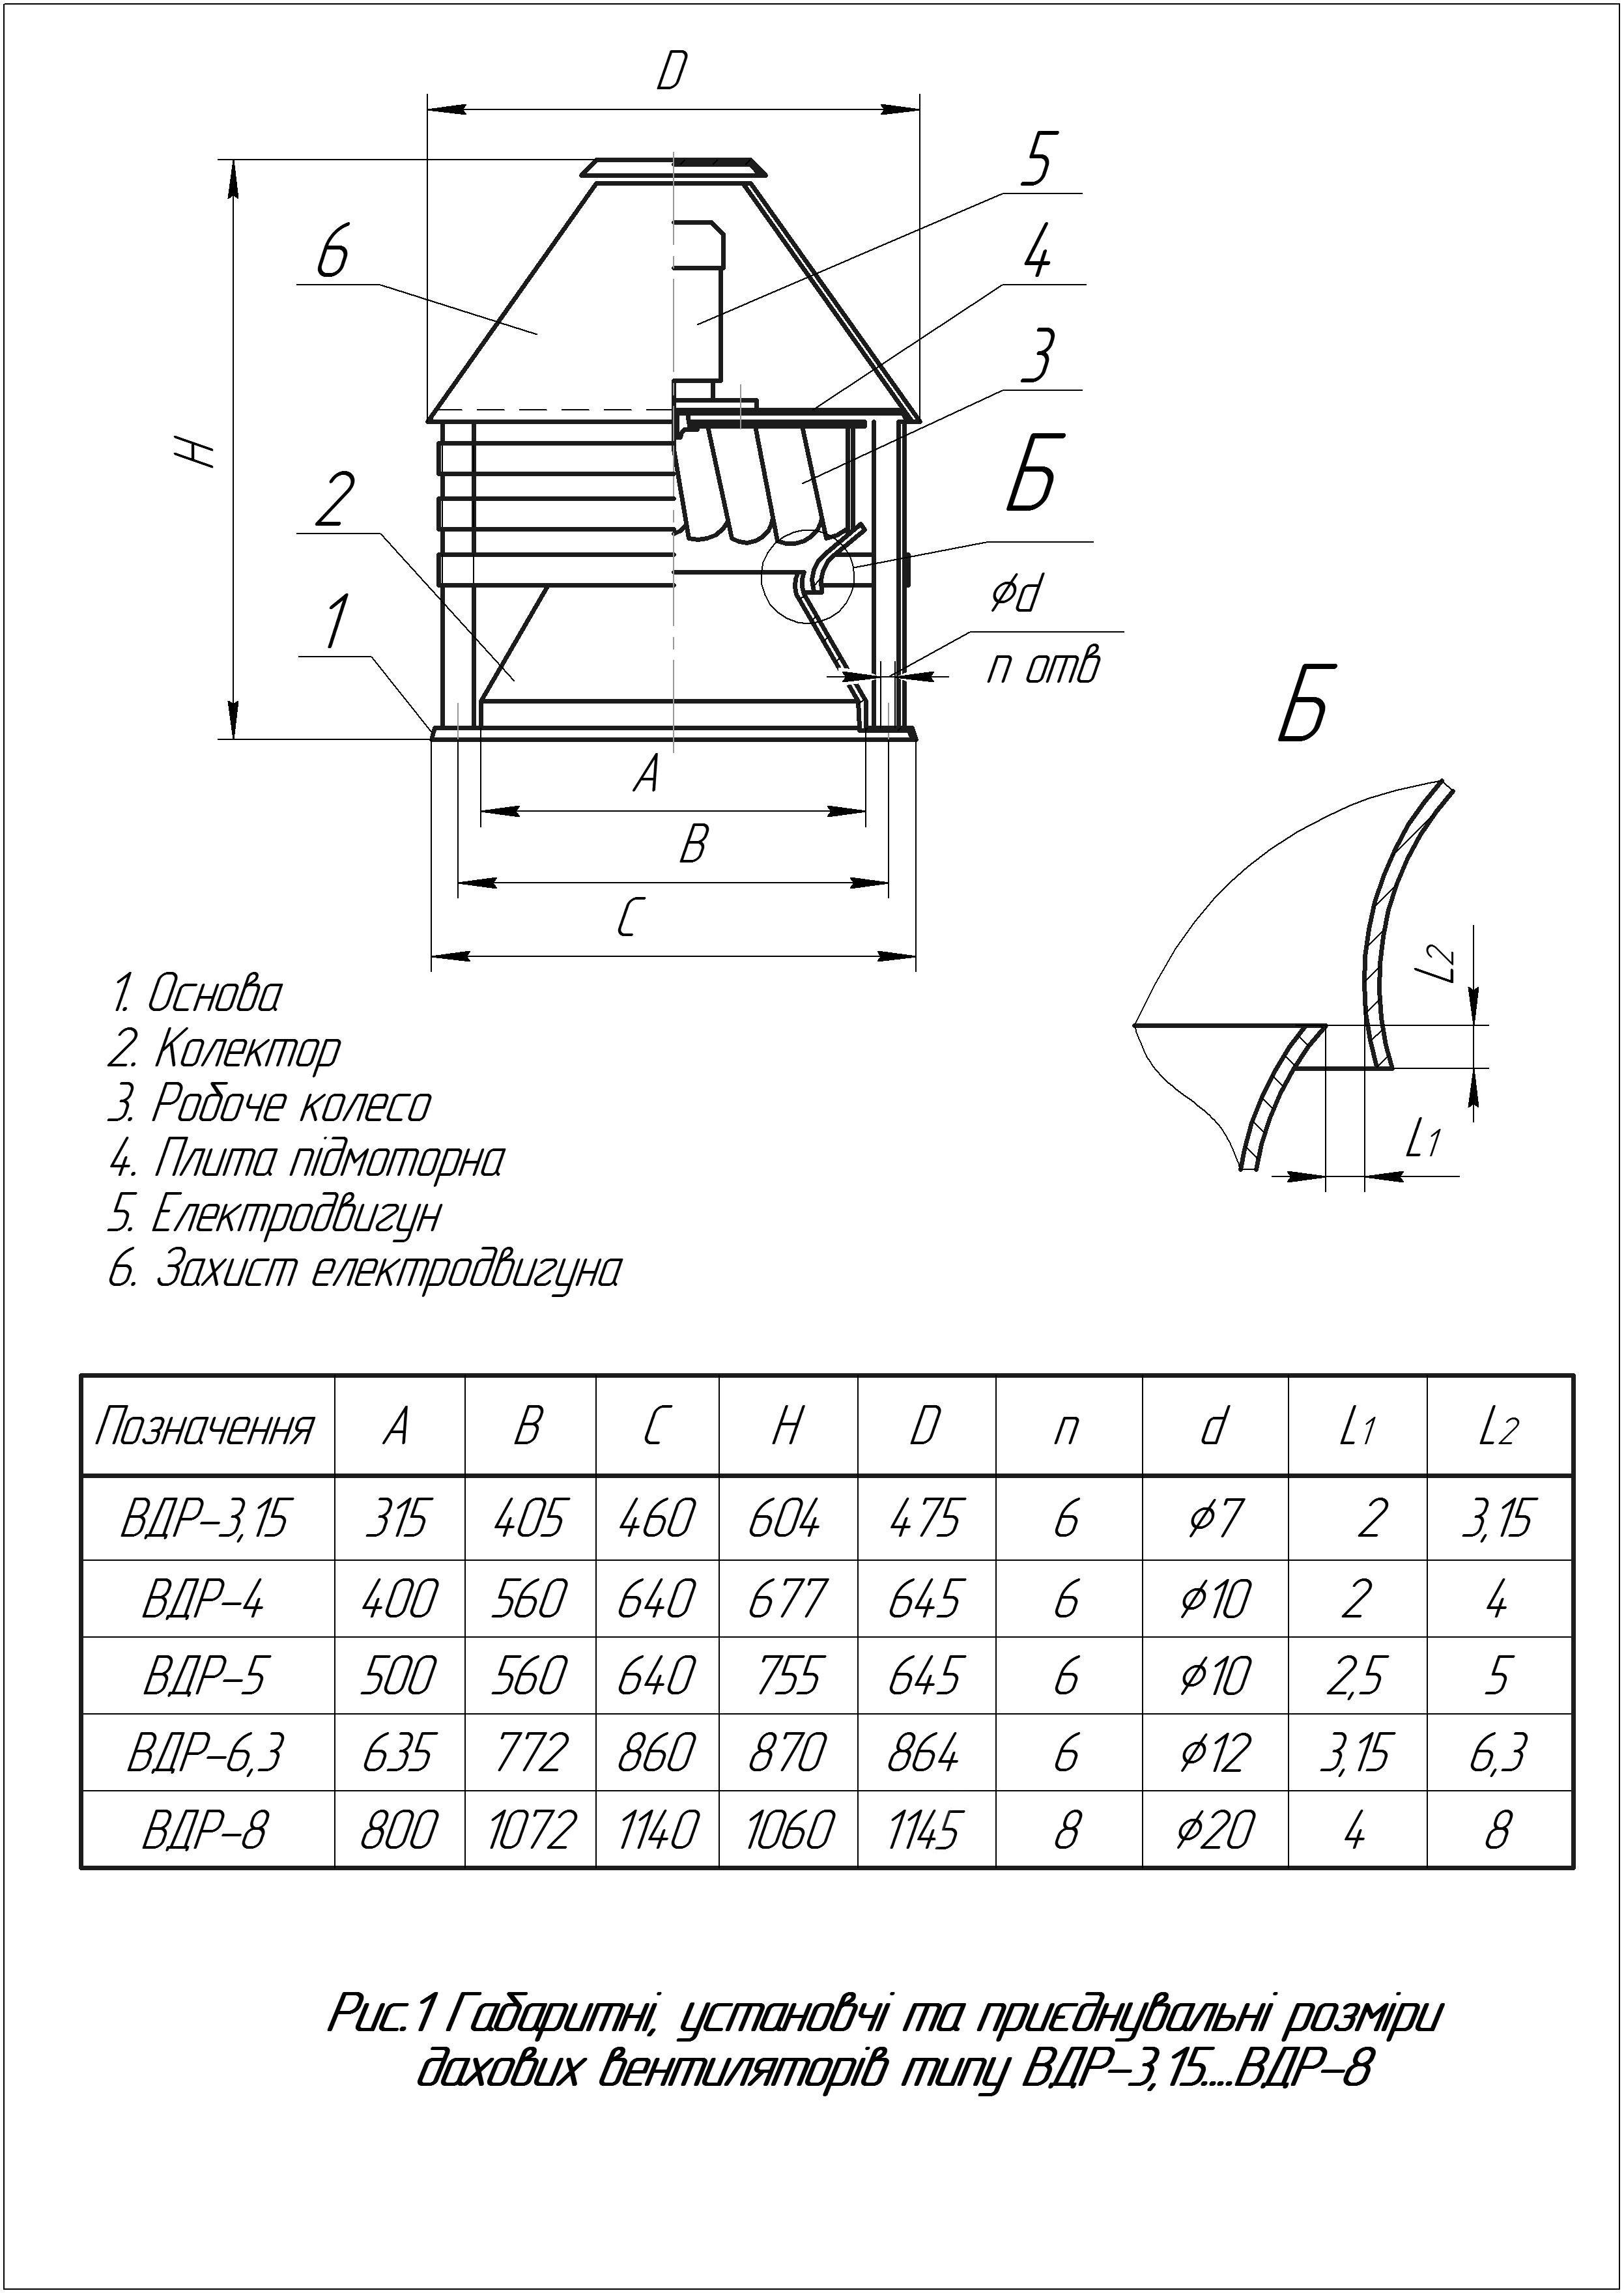 Габаритная схема вентилятора ВКР №3,15